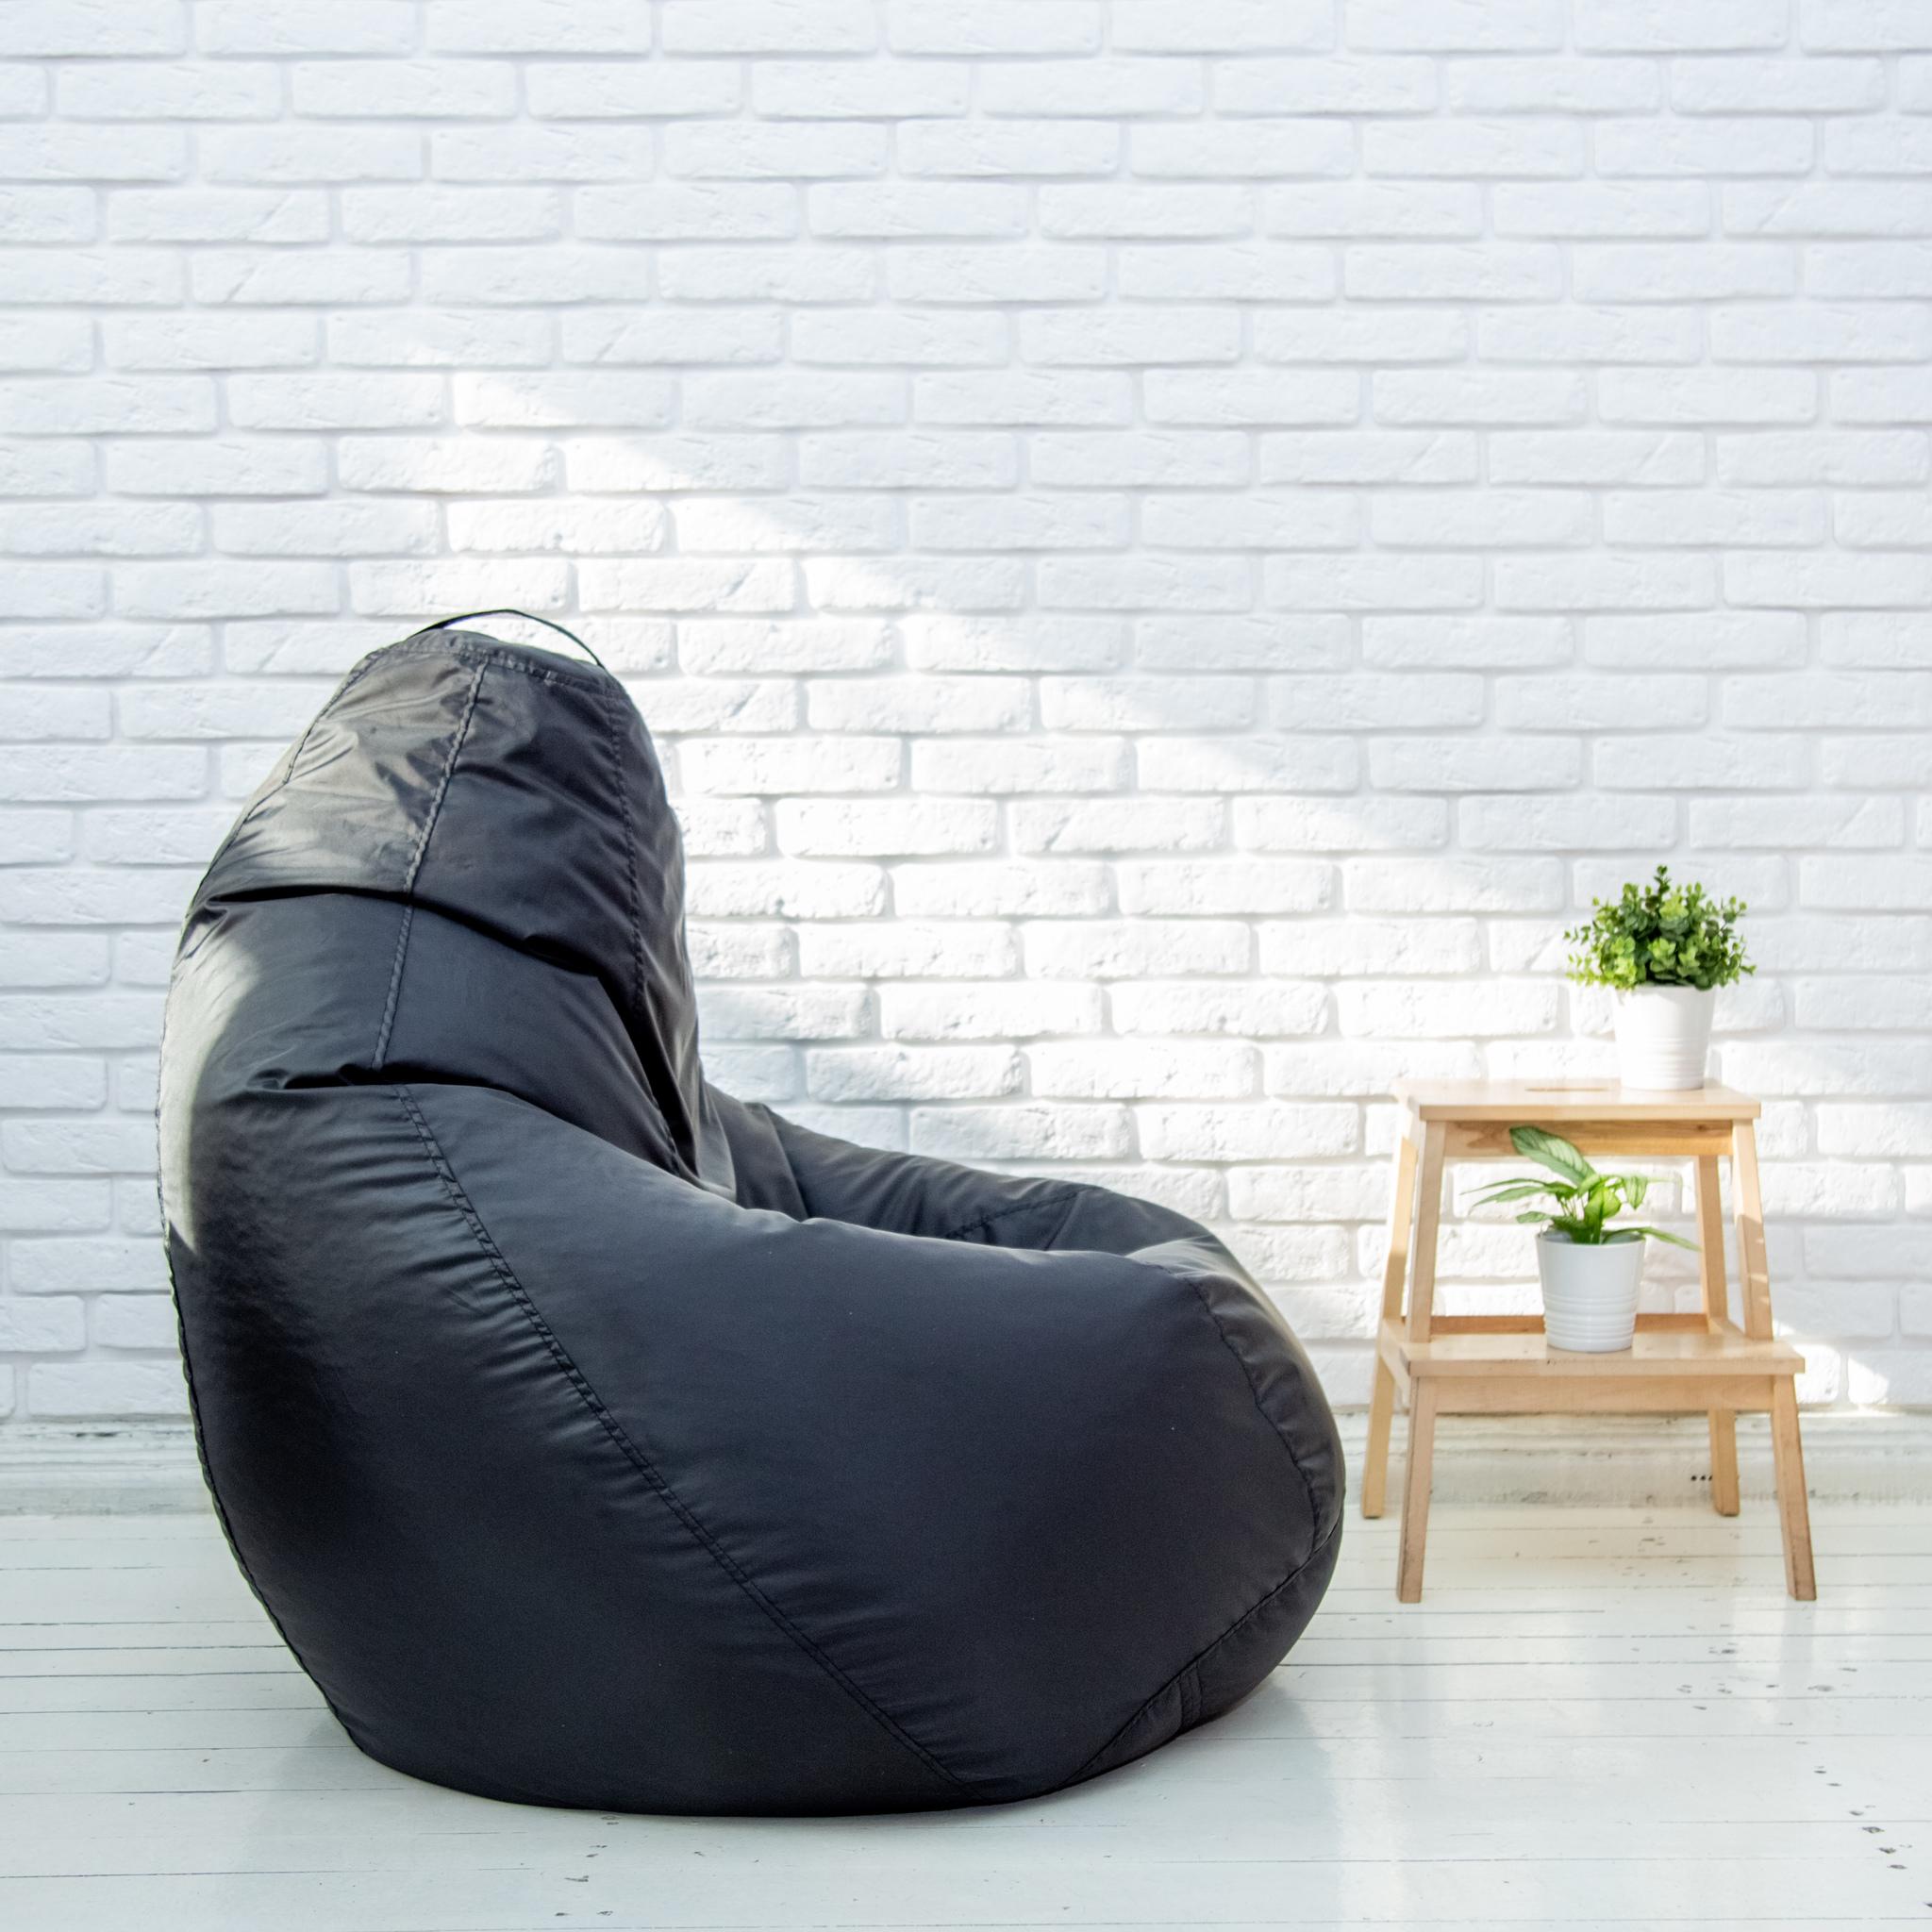 Груша XL плащёвка, несъёмный чехол (чёрная)